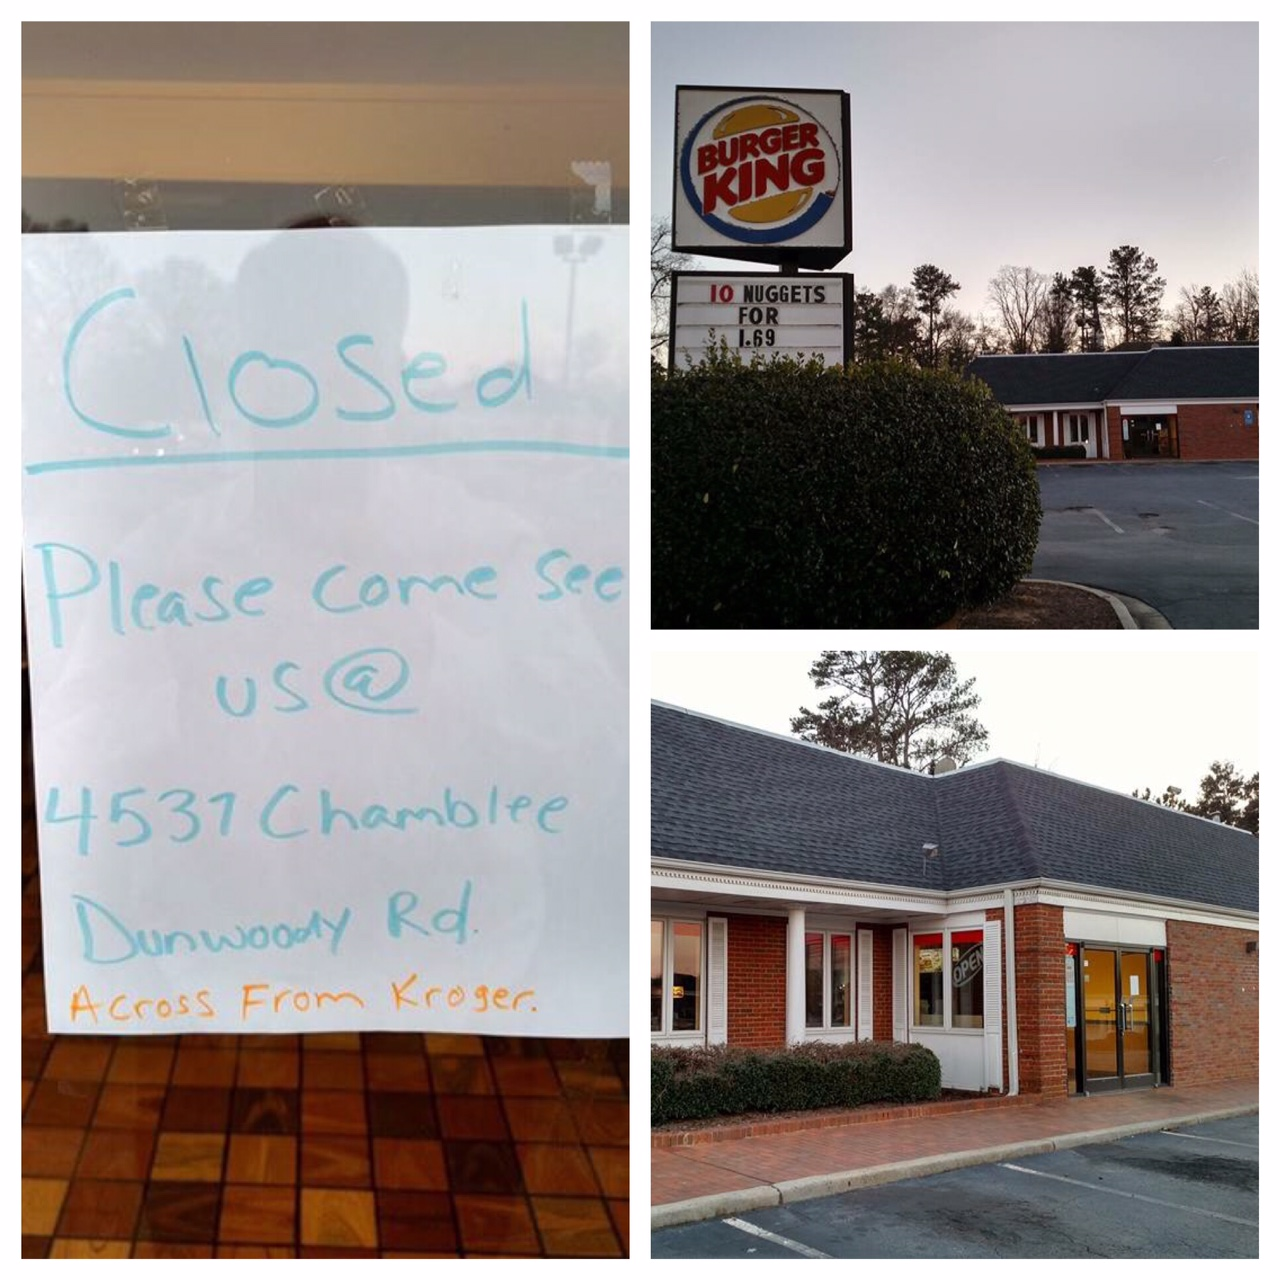 Tomorrow S News Today Atlanta Closure Alert Burger King